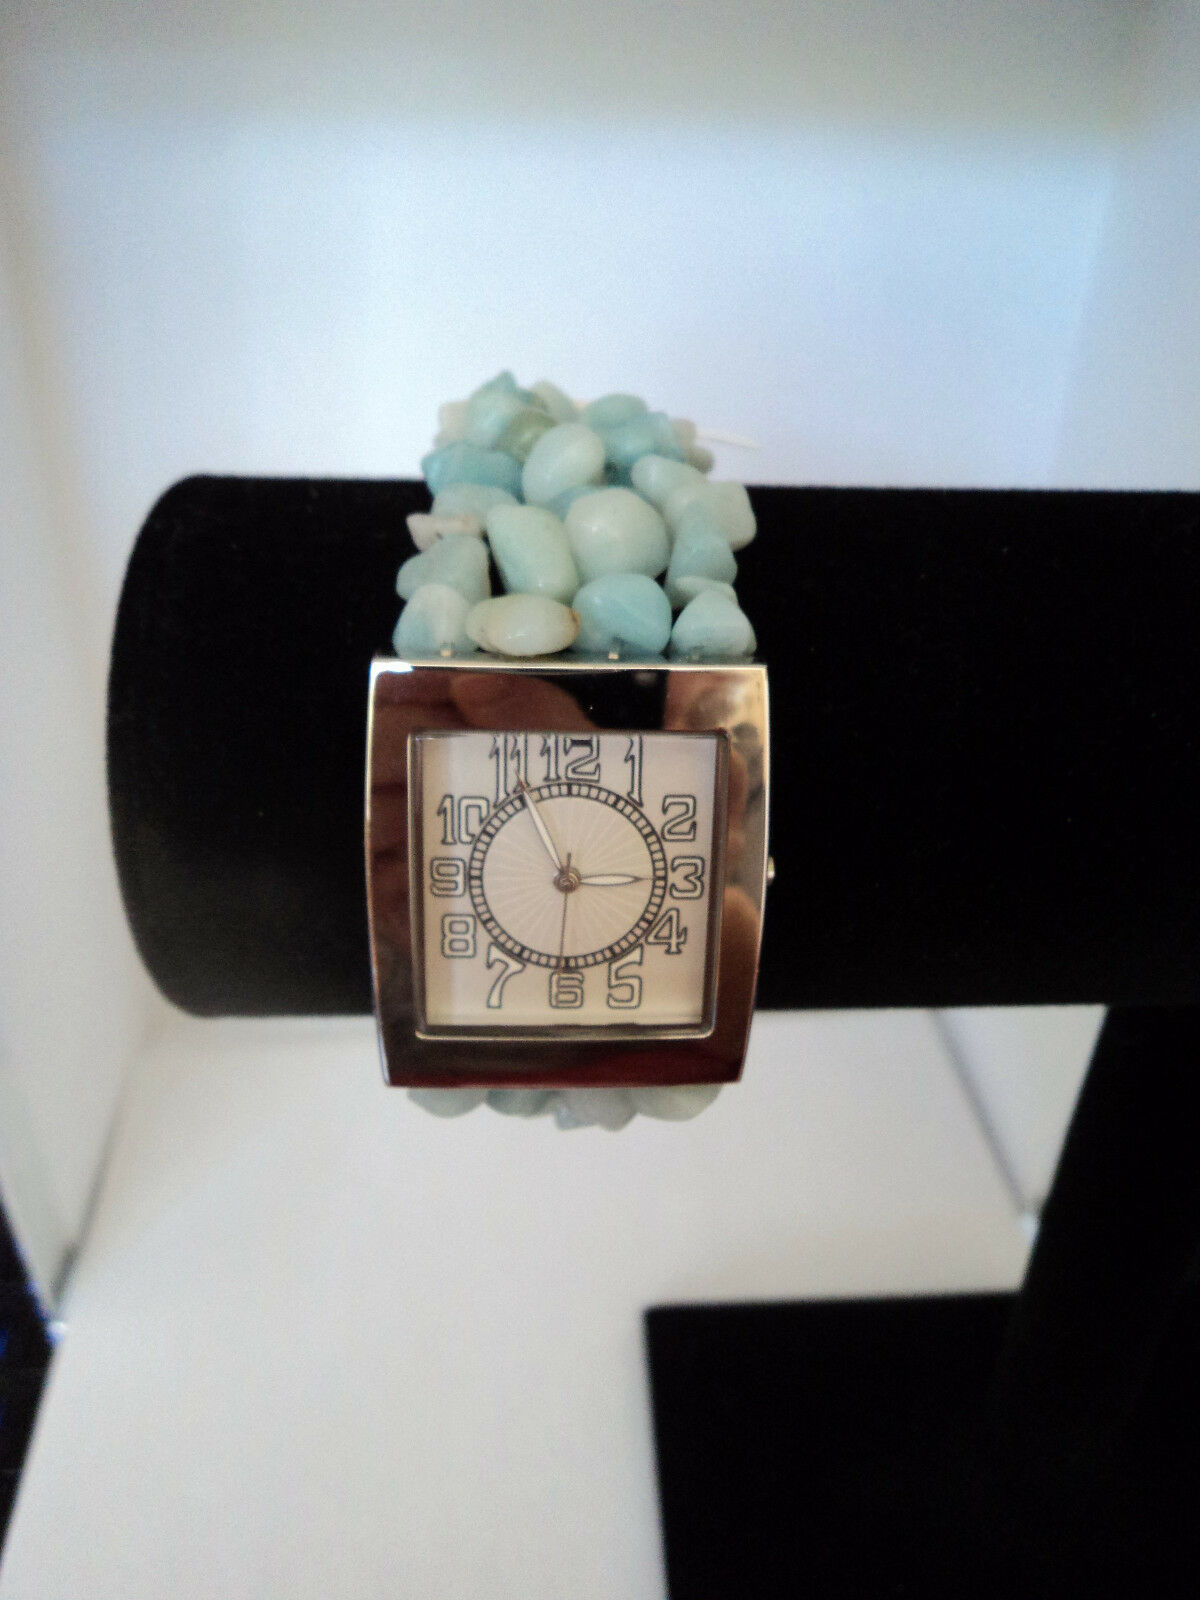 Avon Semi-Precious Chip Stretch Watch Green Needs Battery New 2007 Stock